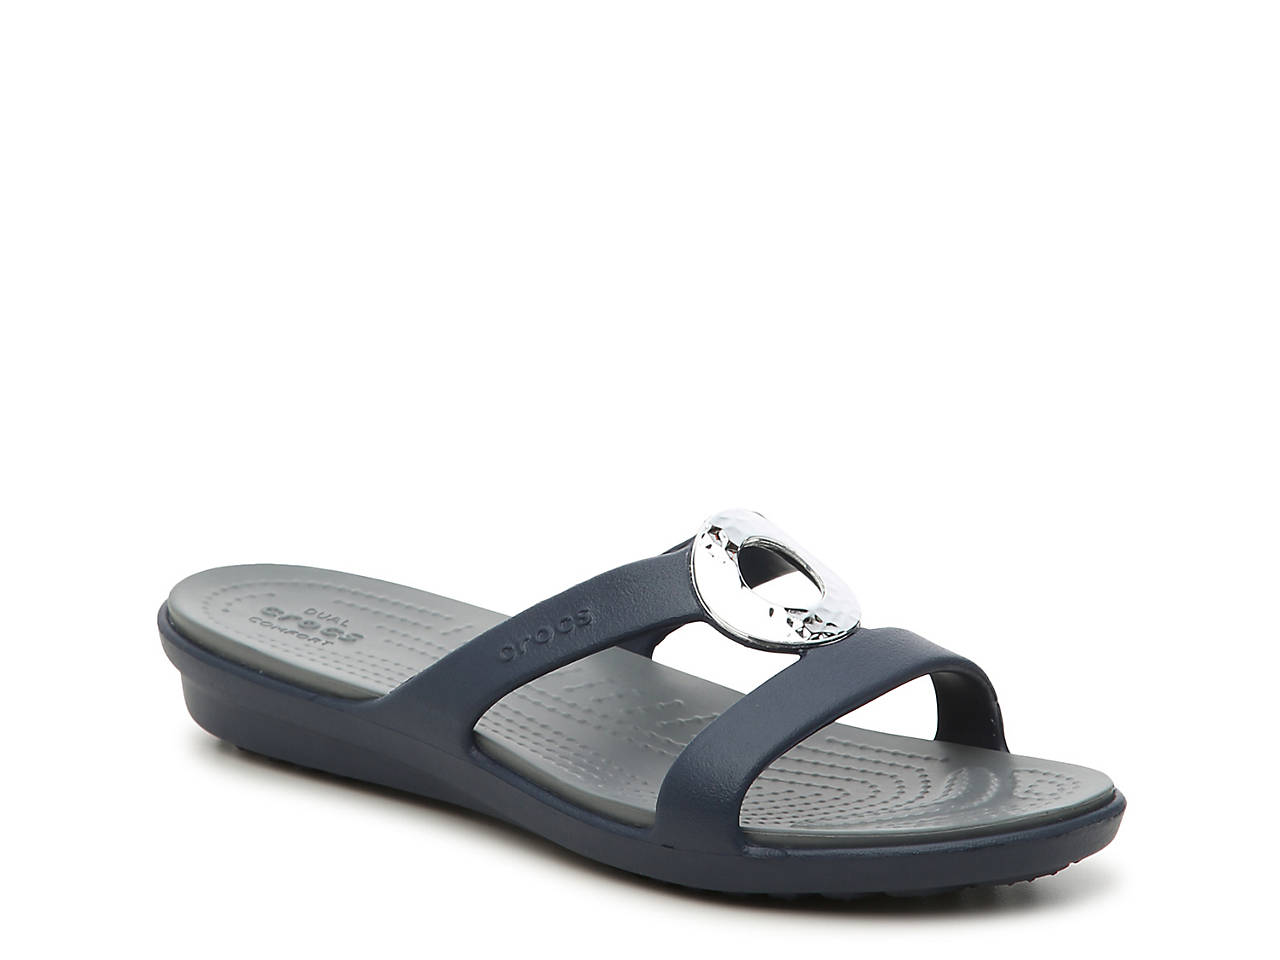 Women's Crocs Sanrah Hammered Sandals on hot sale JO7Kw